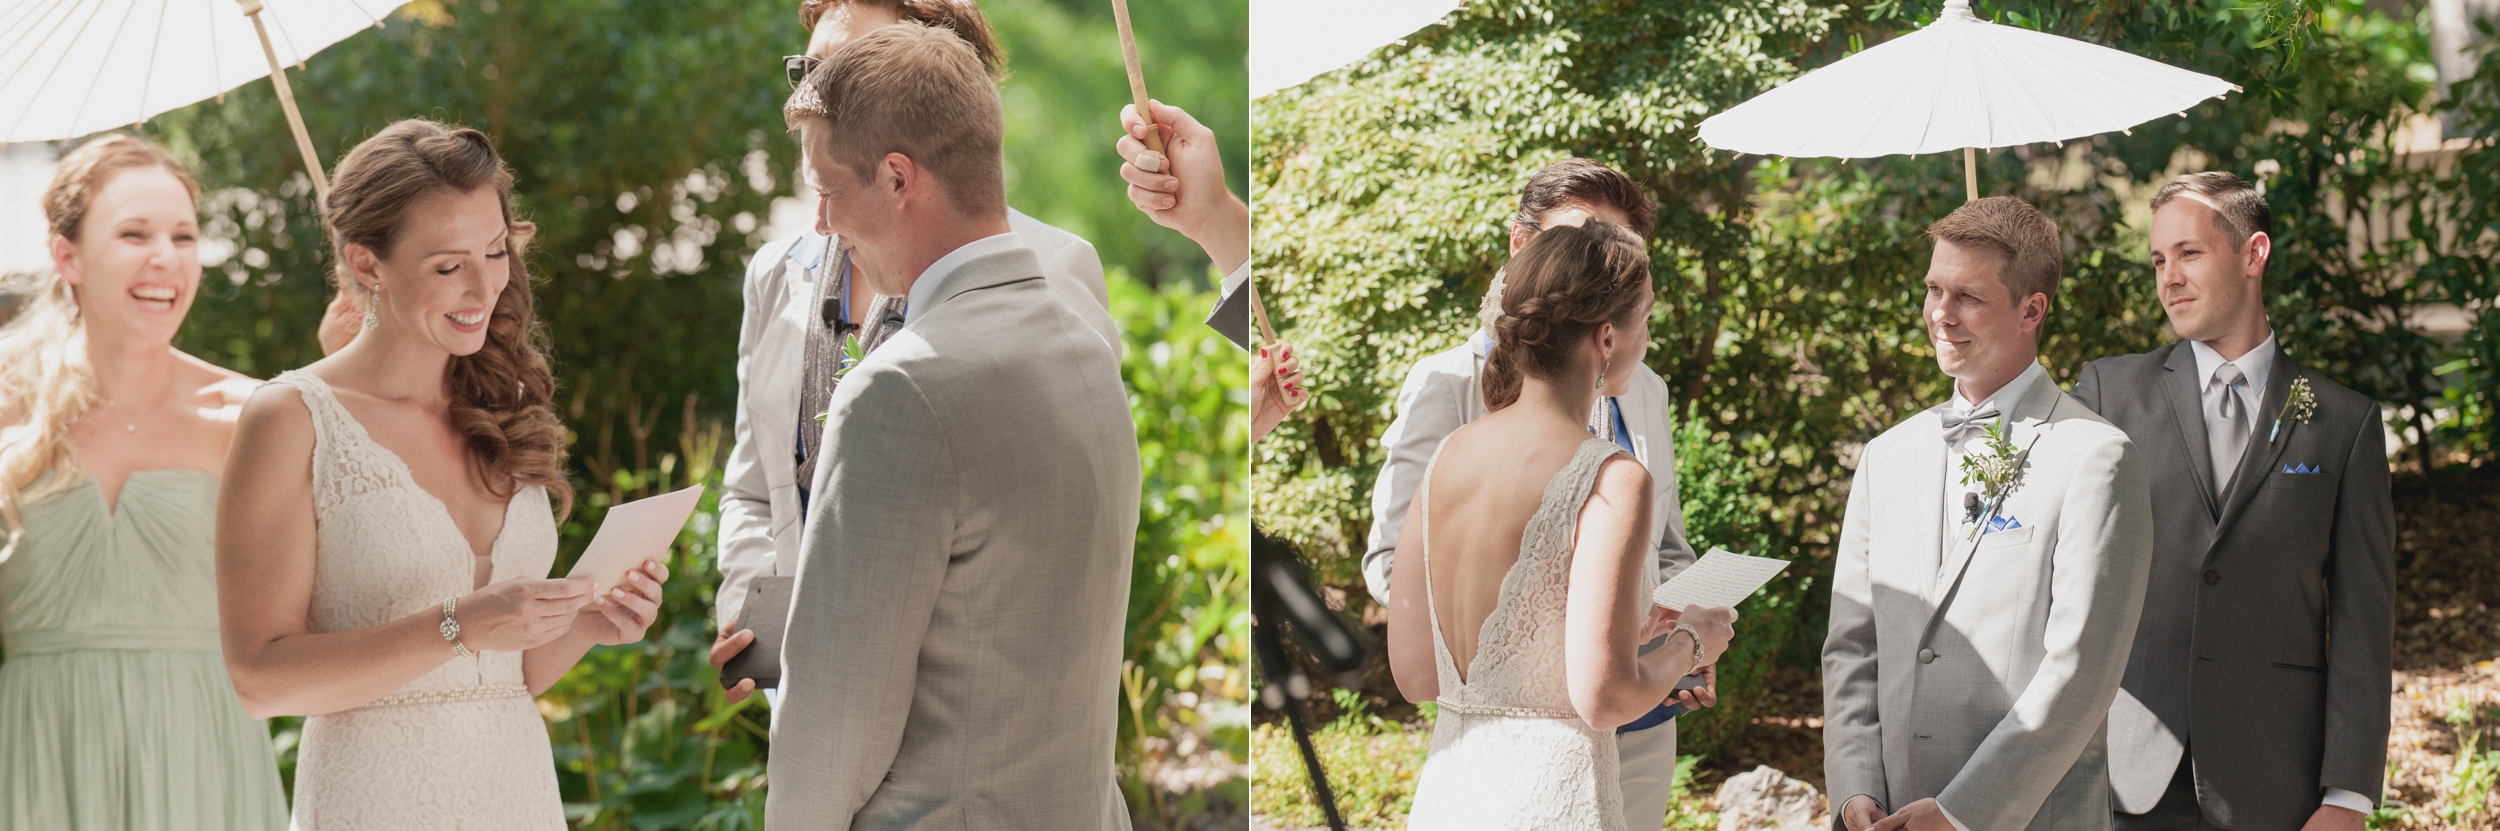 11-down-to-earth-marin-art-garden-center-wedding-vivianchen.jpg